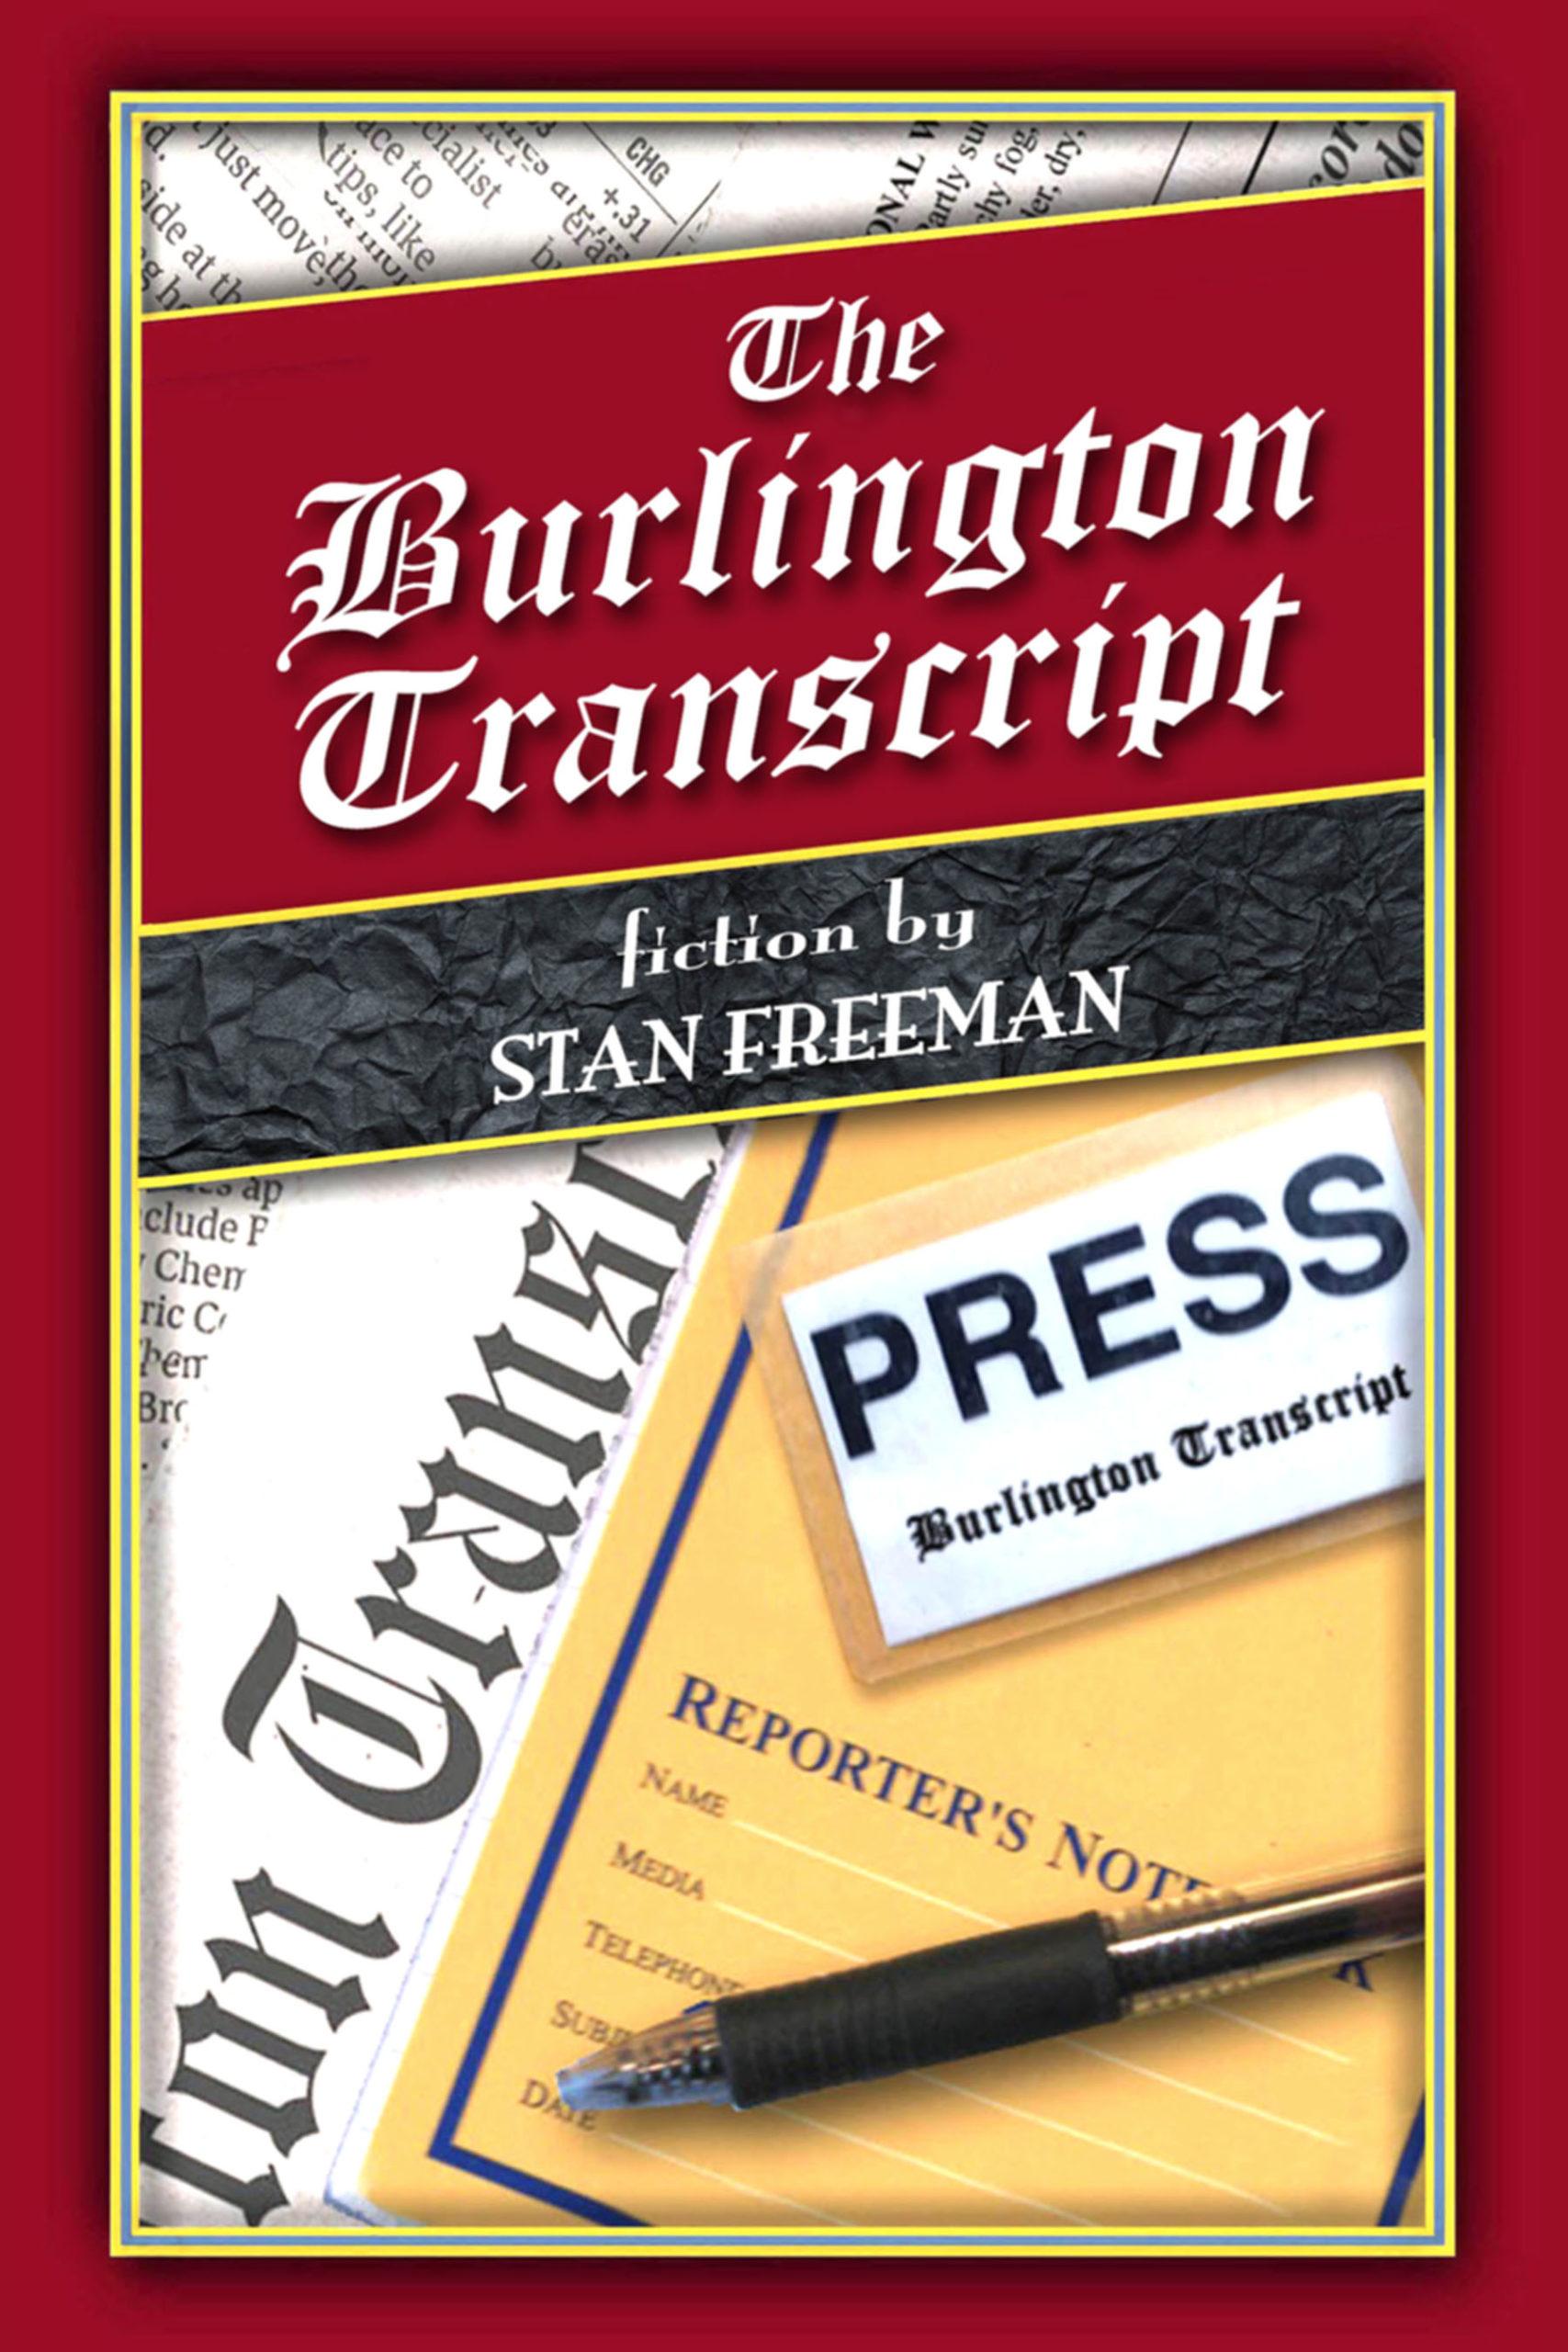 The Burlington Transcript